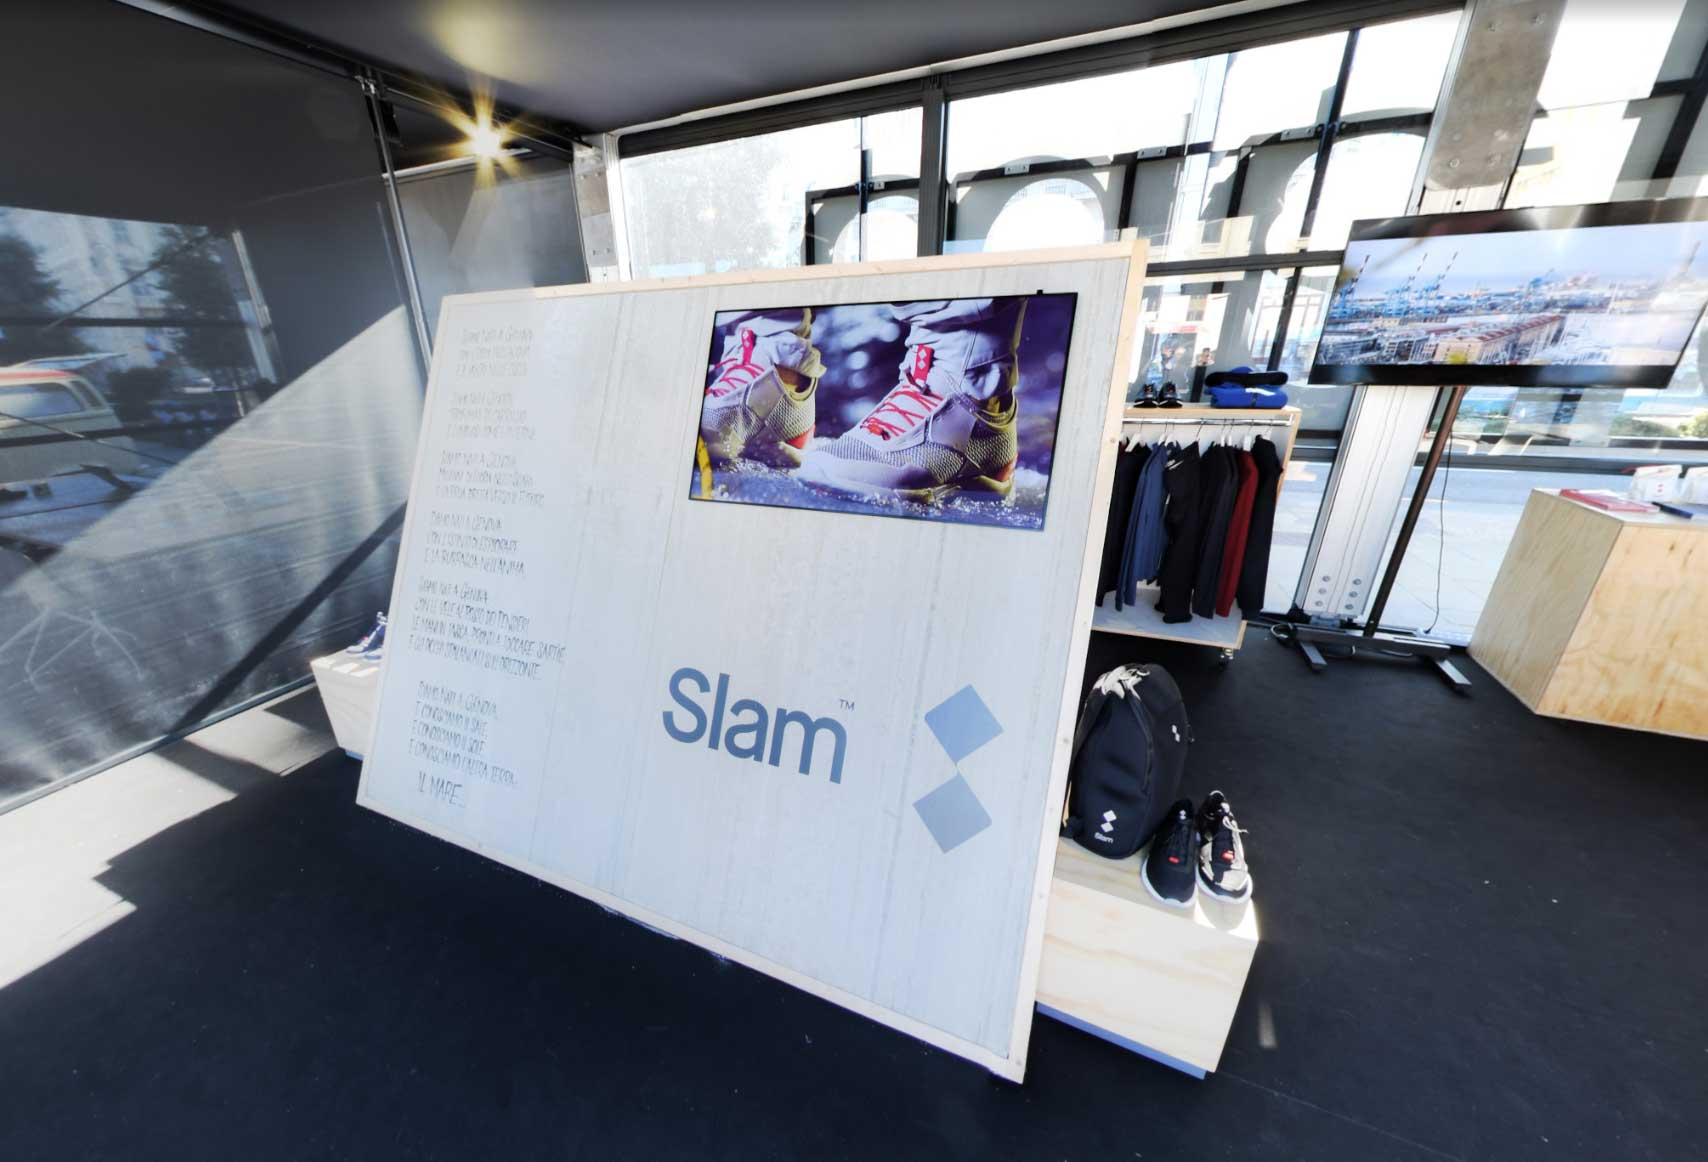 Servizio fotografico immersivo per Slam, Slam Hospitality – 49 Barcolana – Trieste